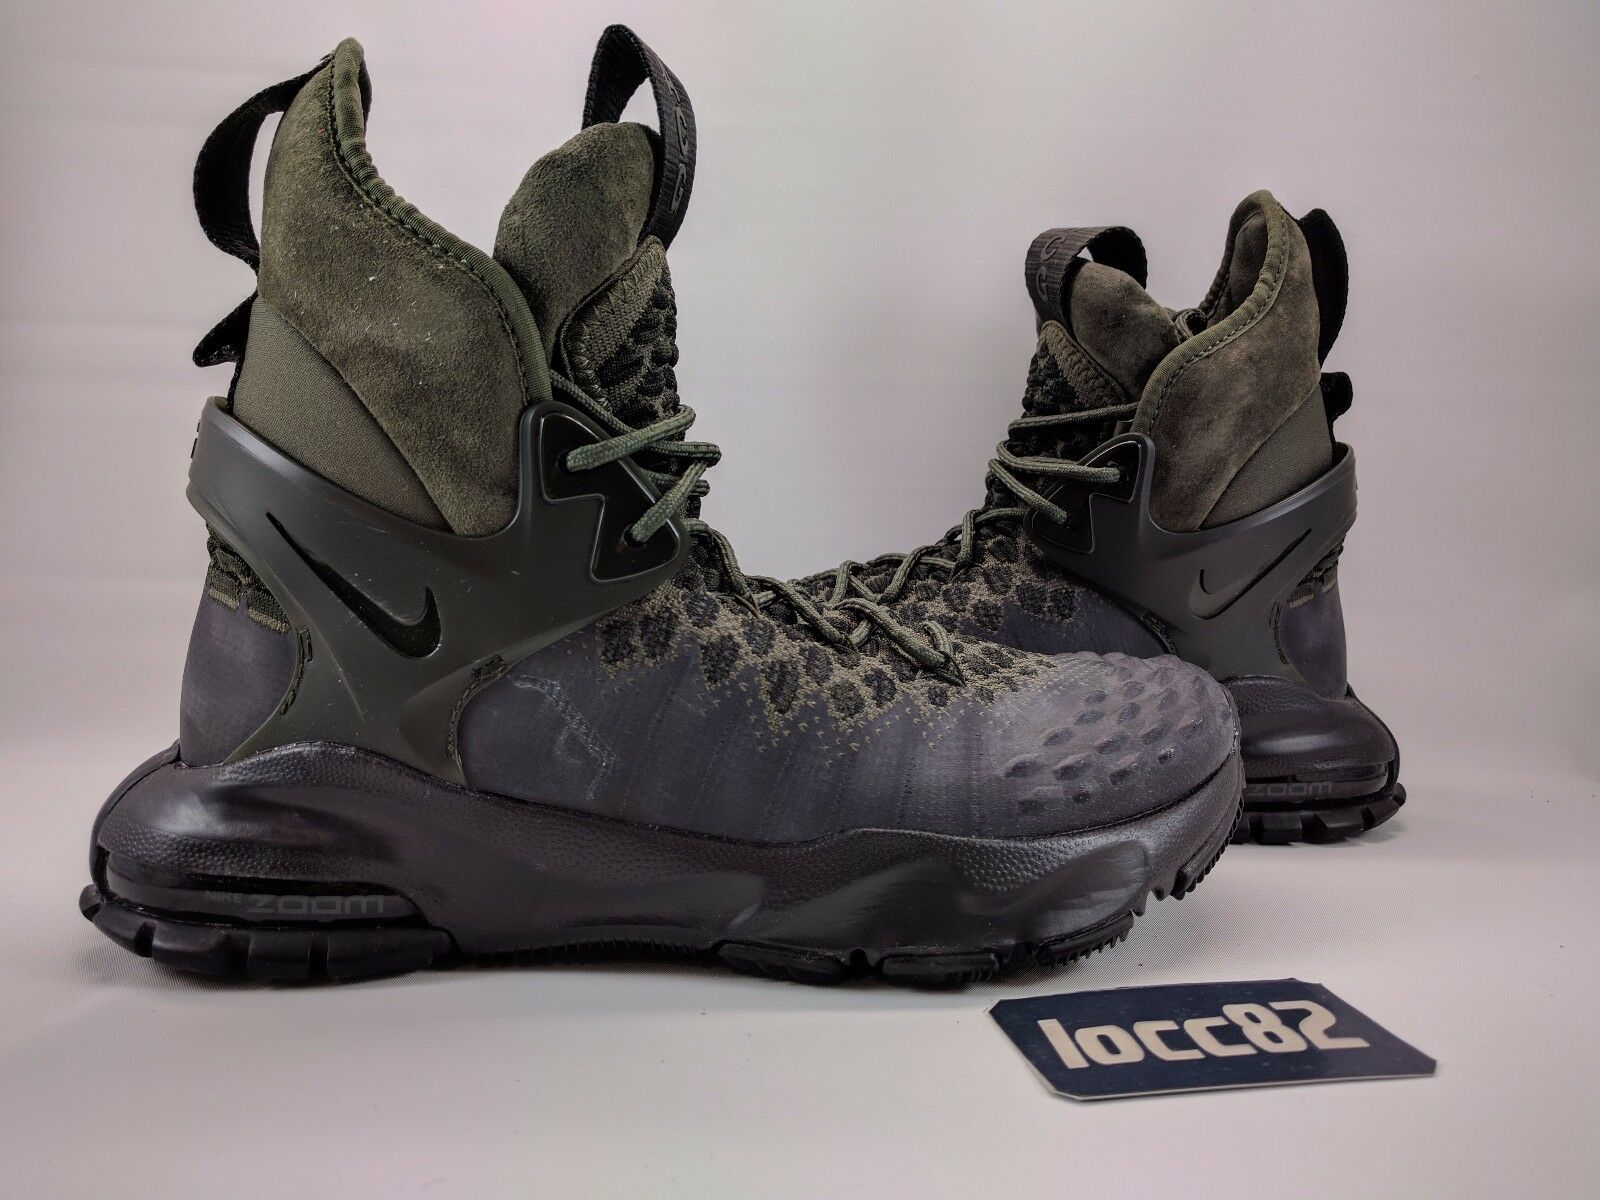 Nike Nikelab Zoom Tallac Flyknit ACG 6.5 8.5 865947 002 hiking trail women 8 10